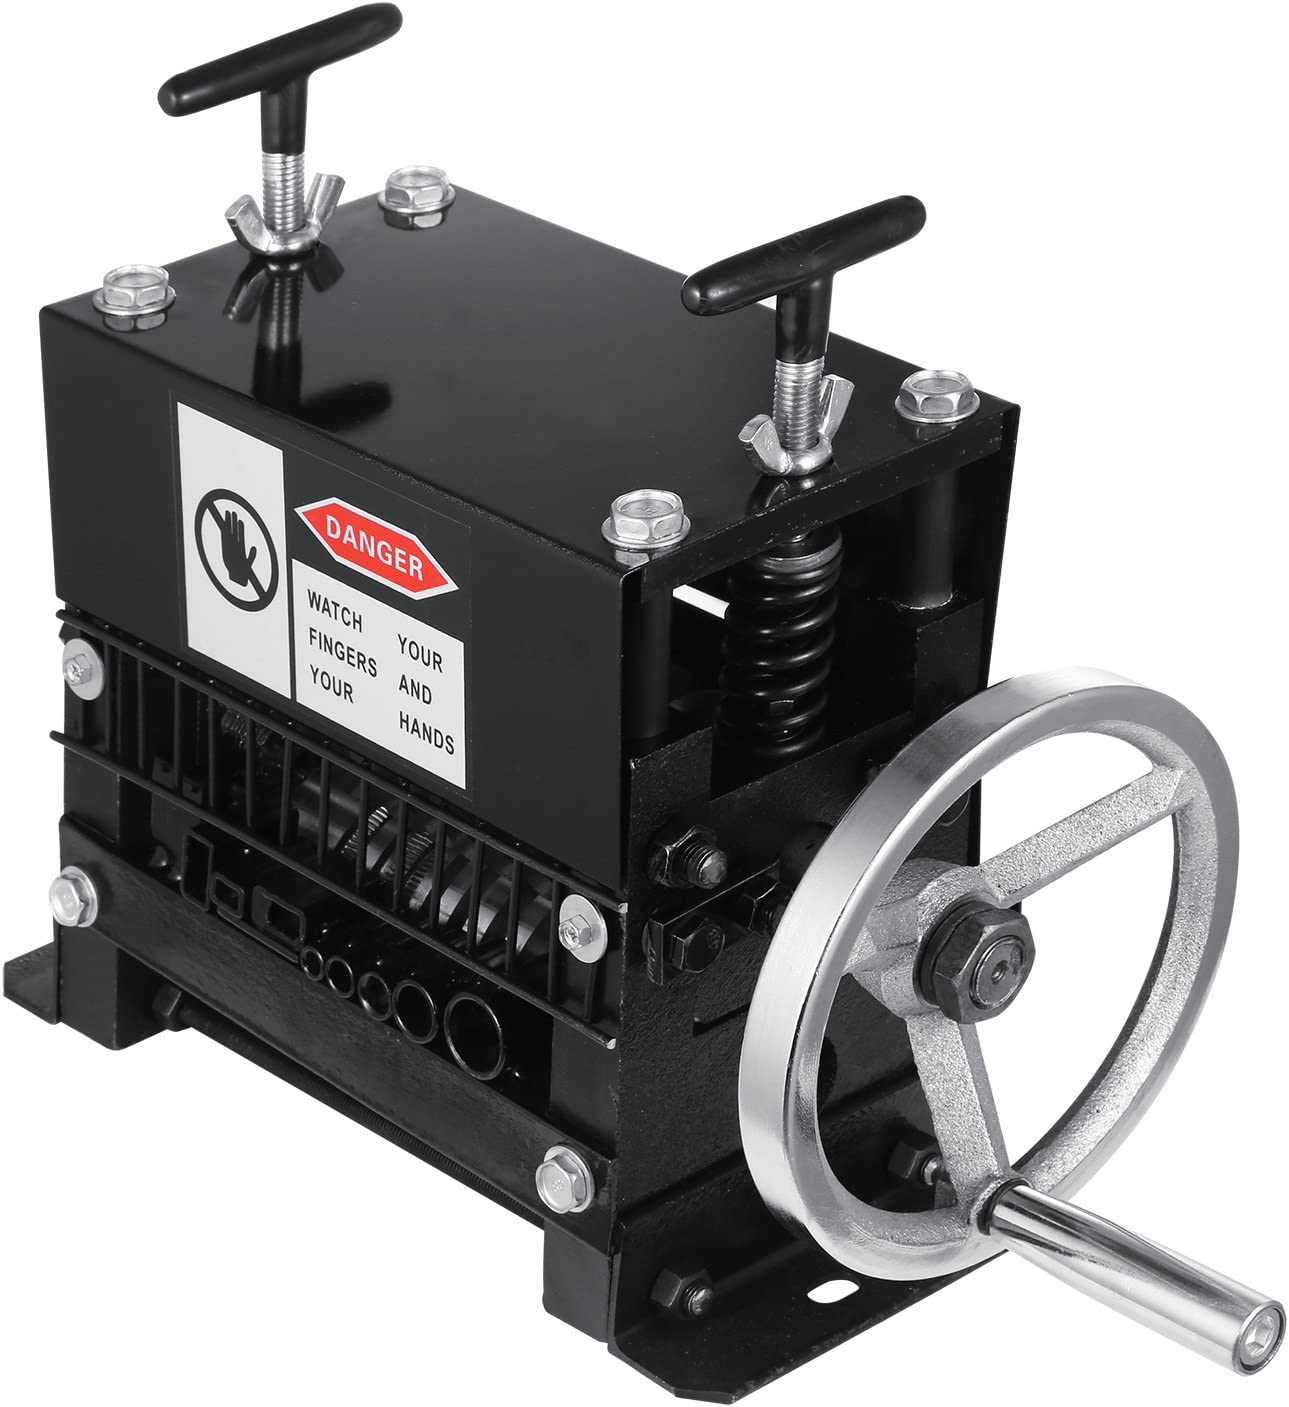 Moracle Pelacable Peladora de cables 220V 1.5-20 mm Cable de Alambre para Desmontar Máquina Y-001-1